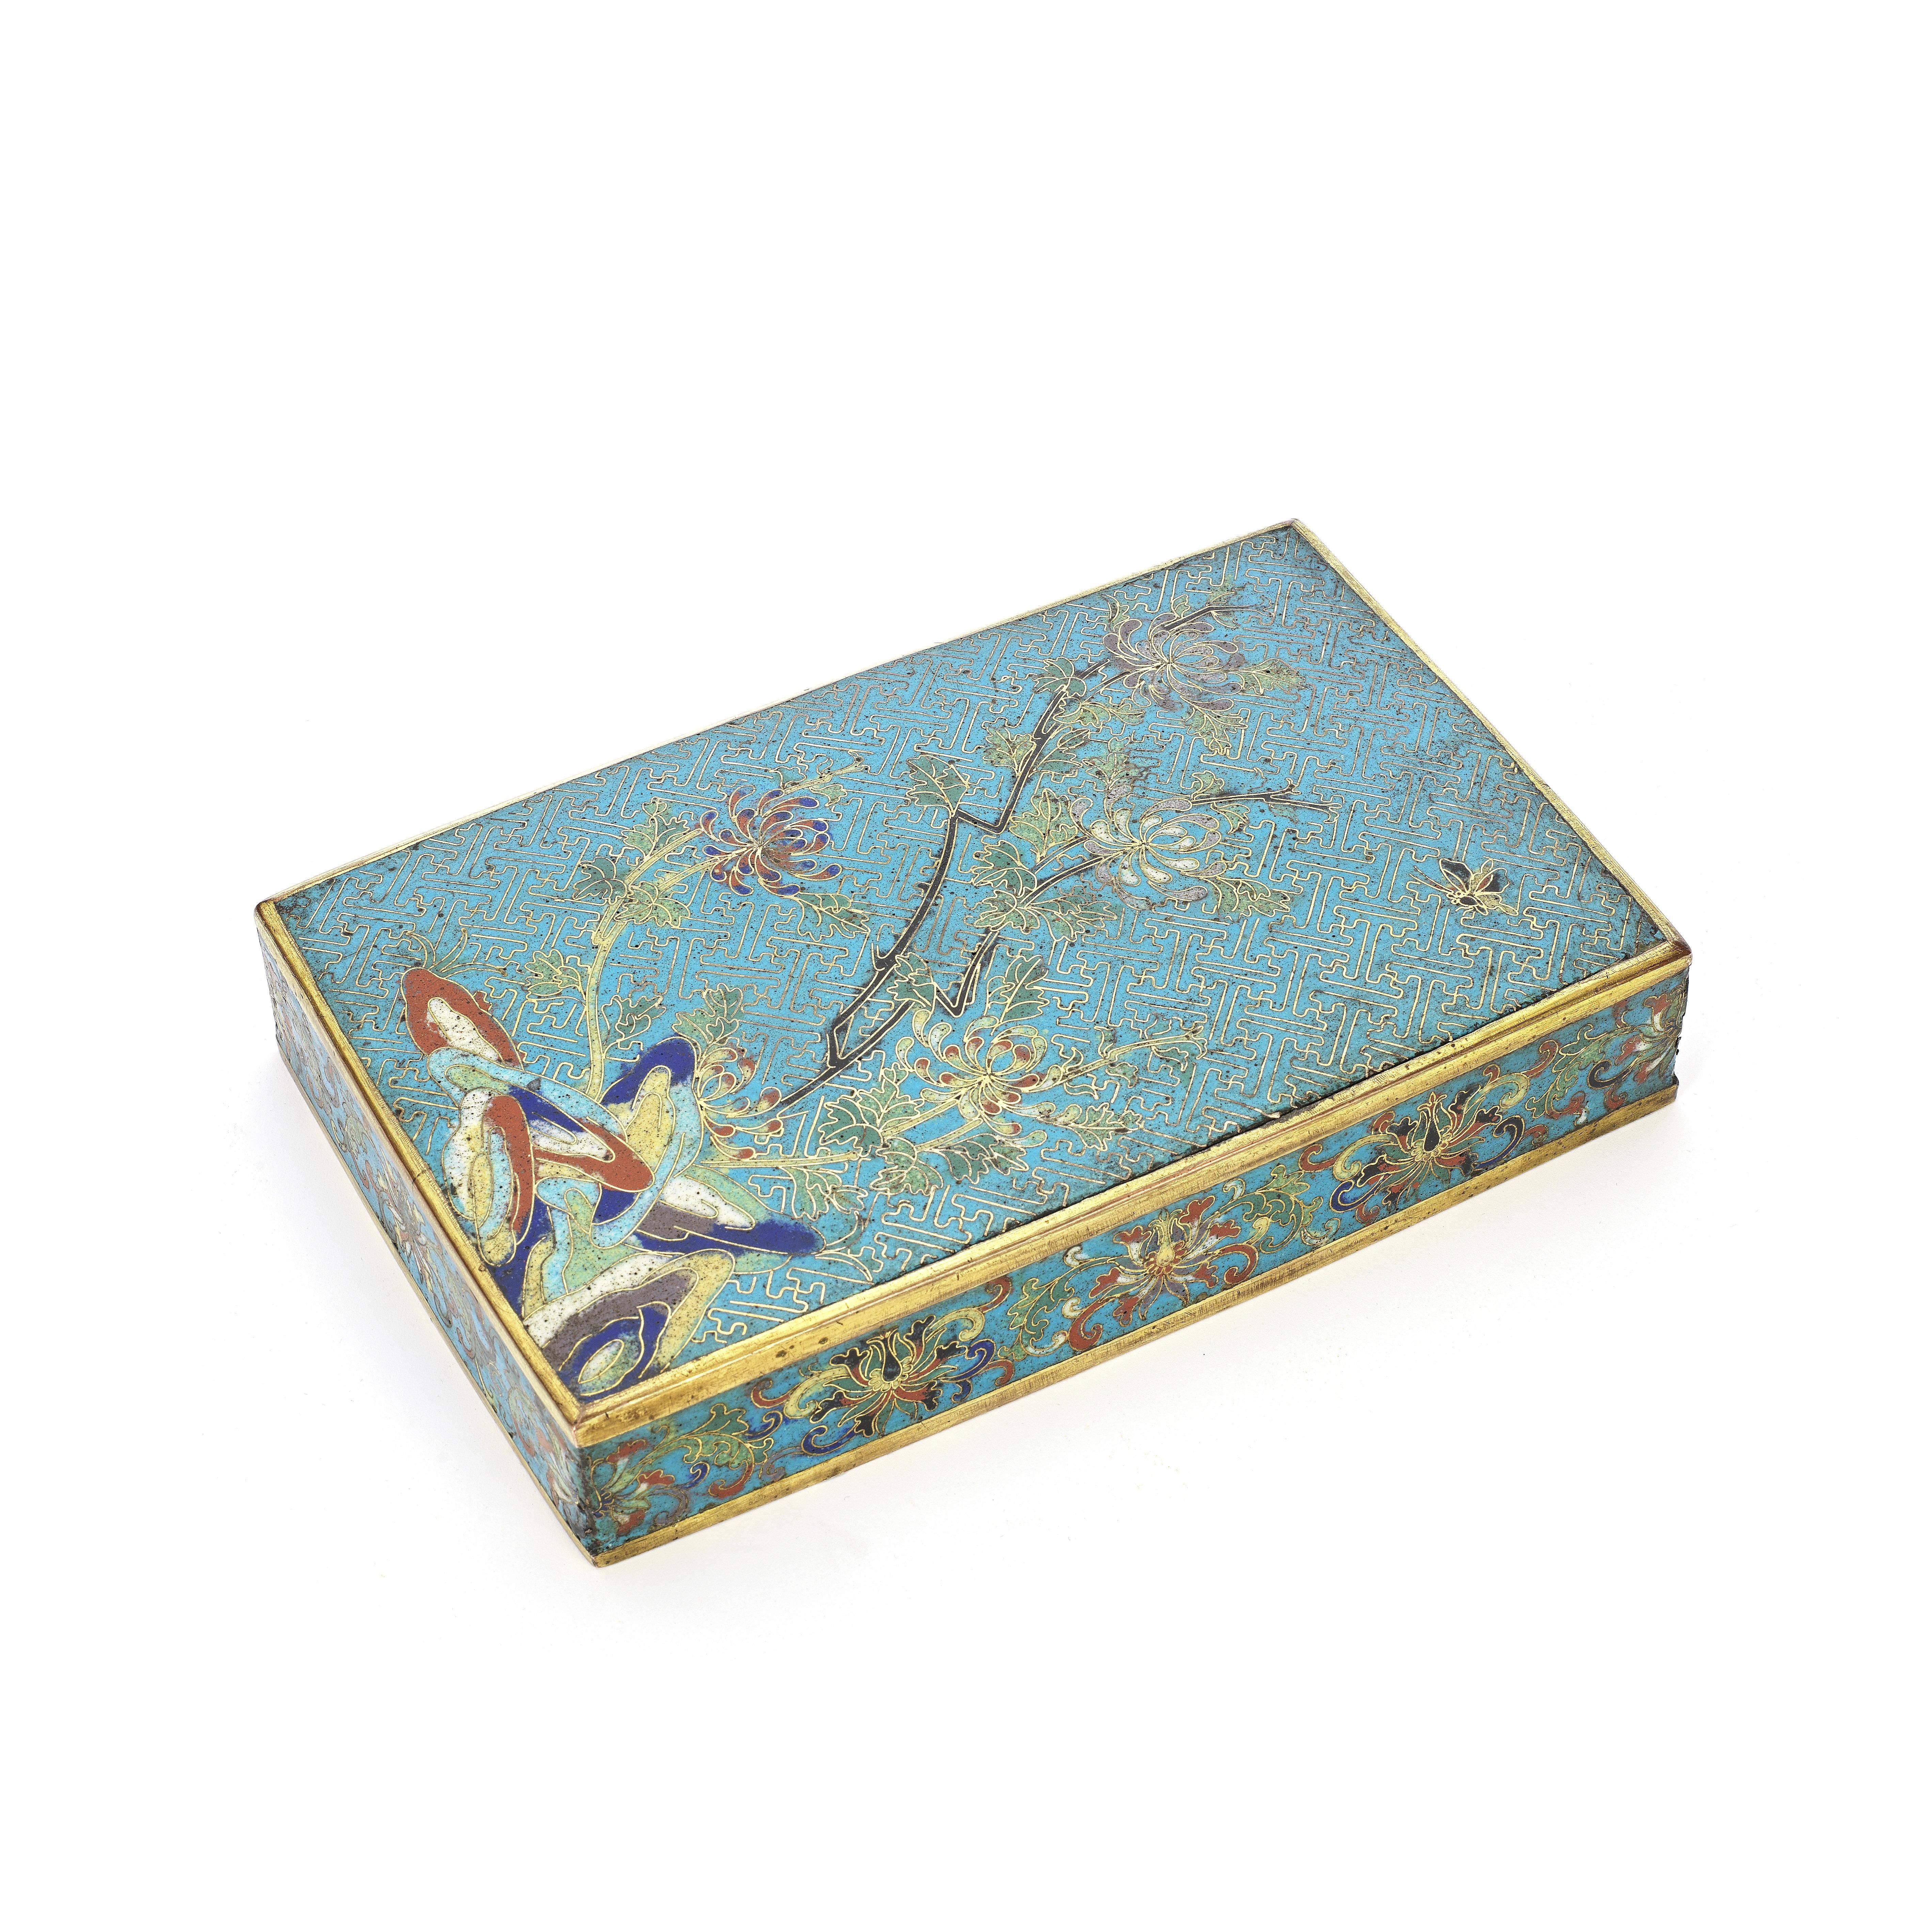 A CLOISONNÉ-ENAMEL RECTANGULAR BOX COVER AND COPPER-ALLOY BOX The cover Qianlong (2)